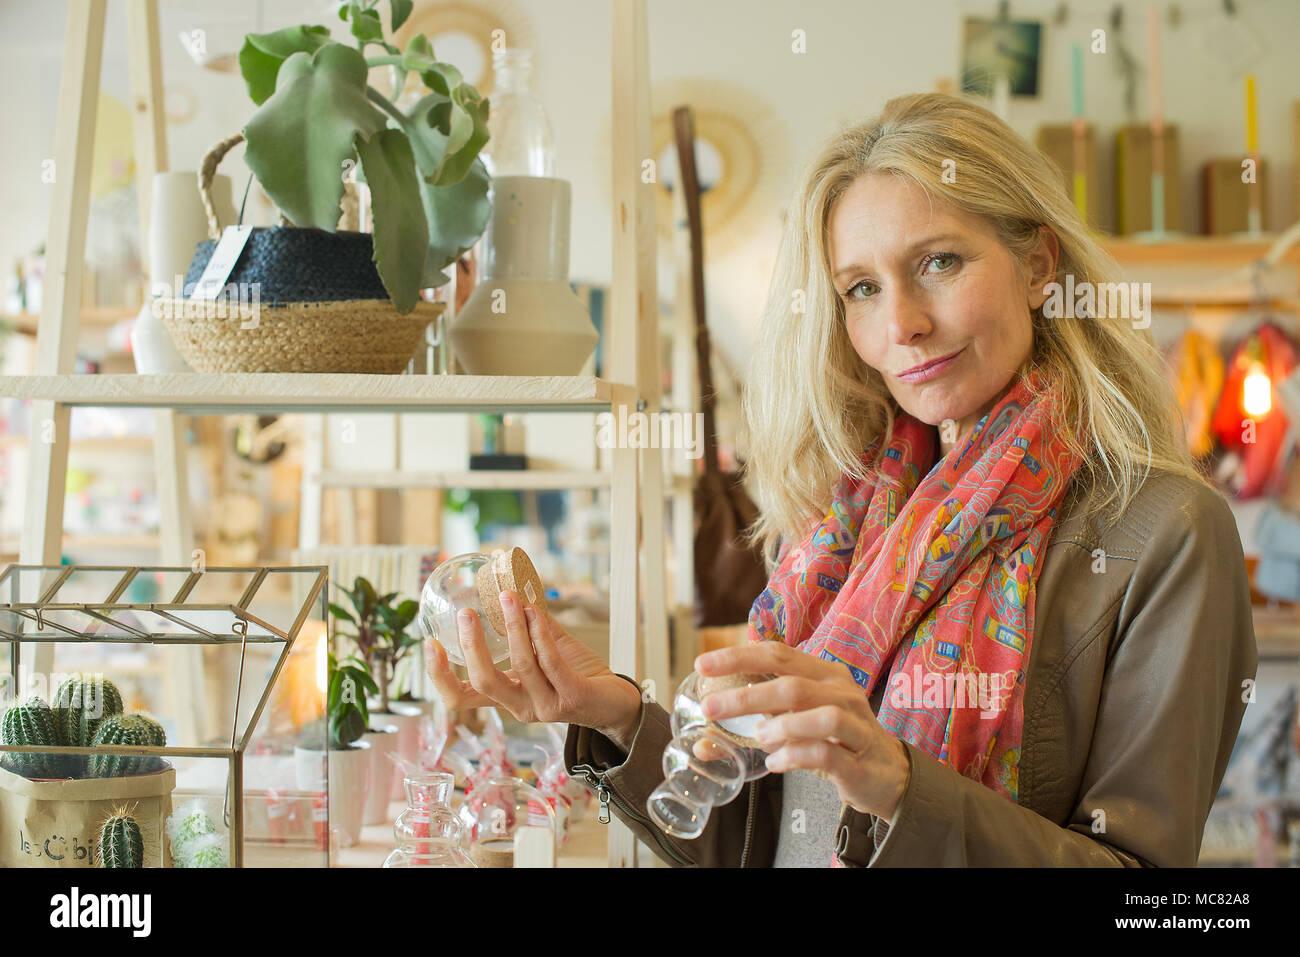 Mature woman shopping, portrait - Stock Image